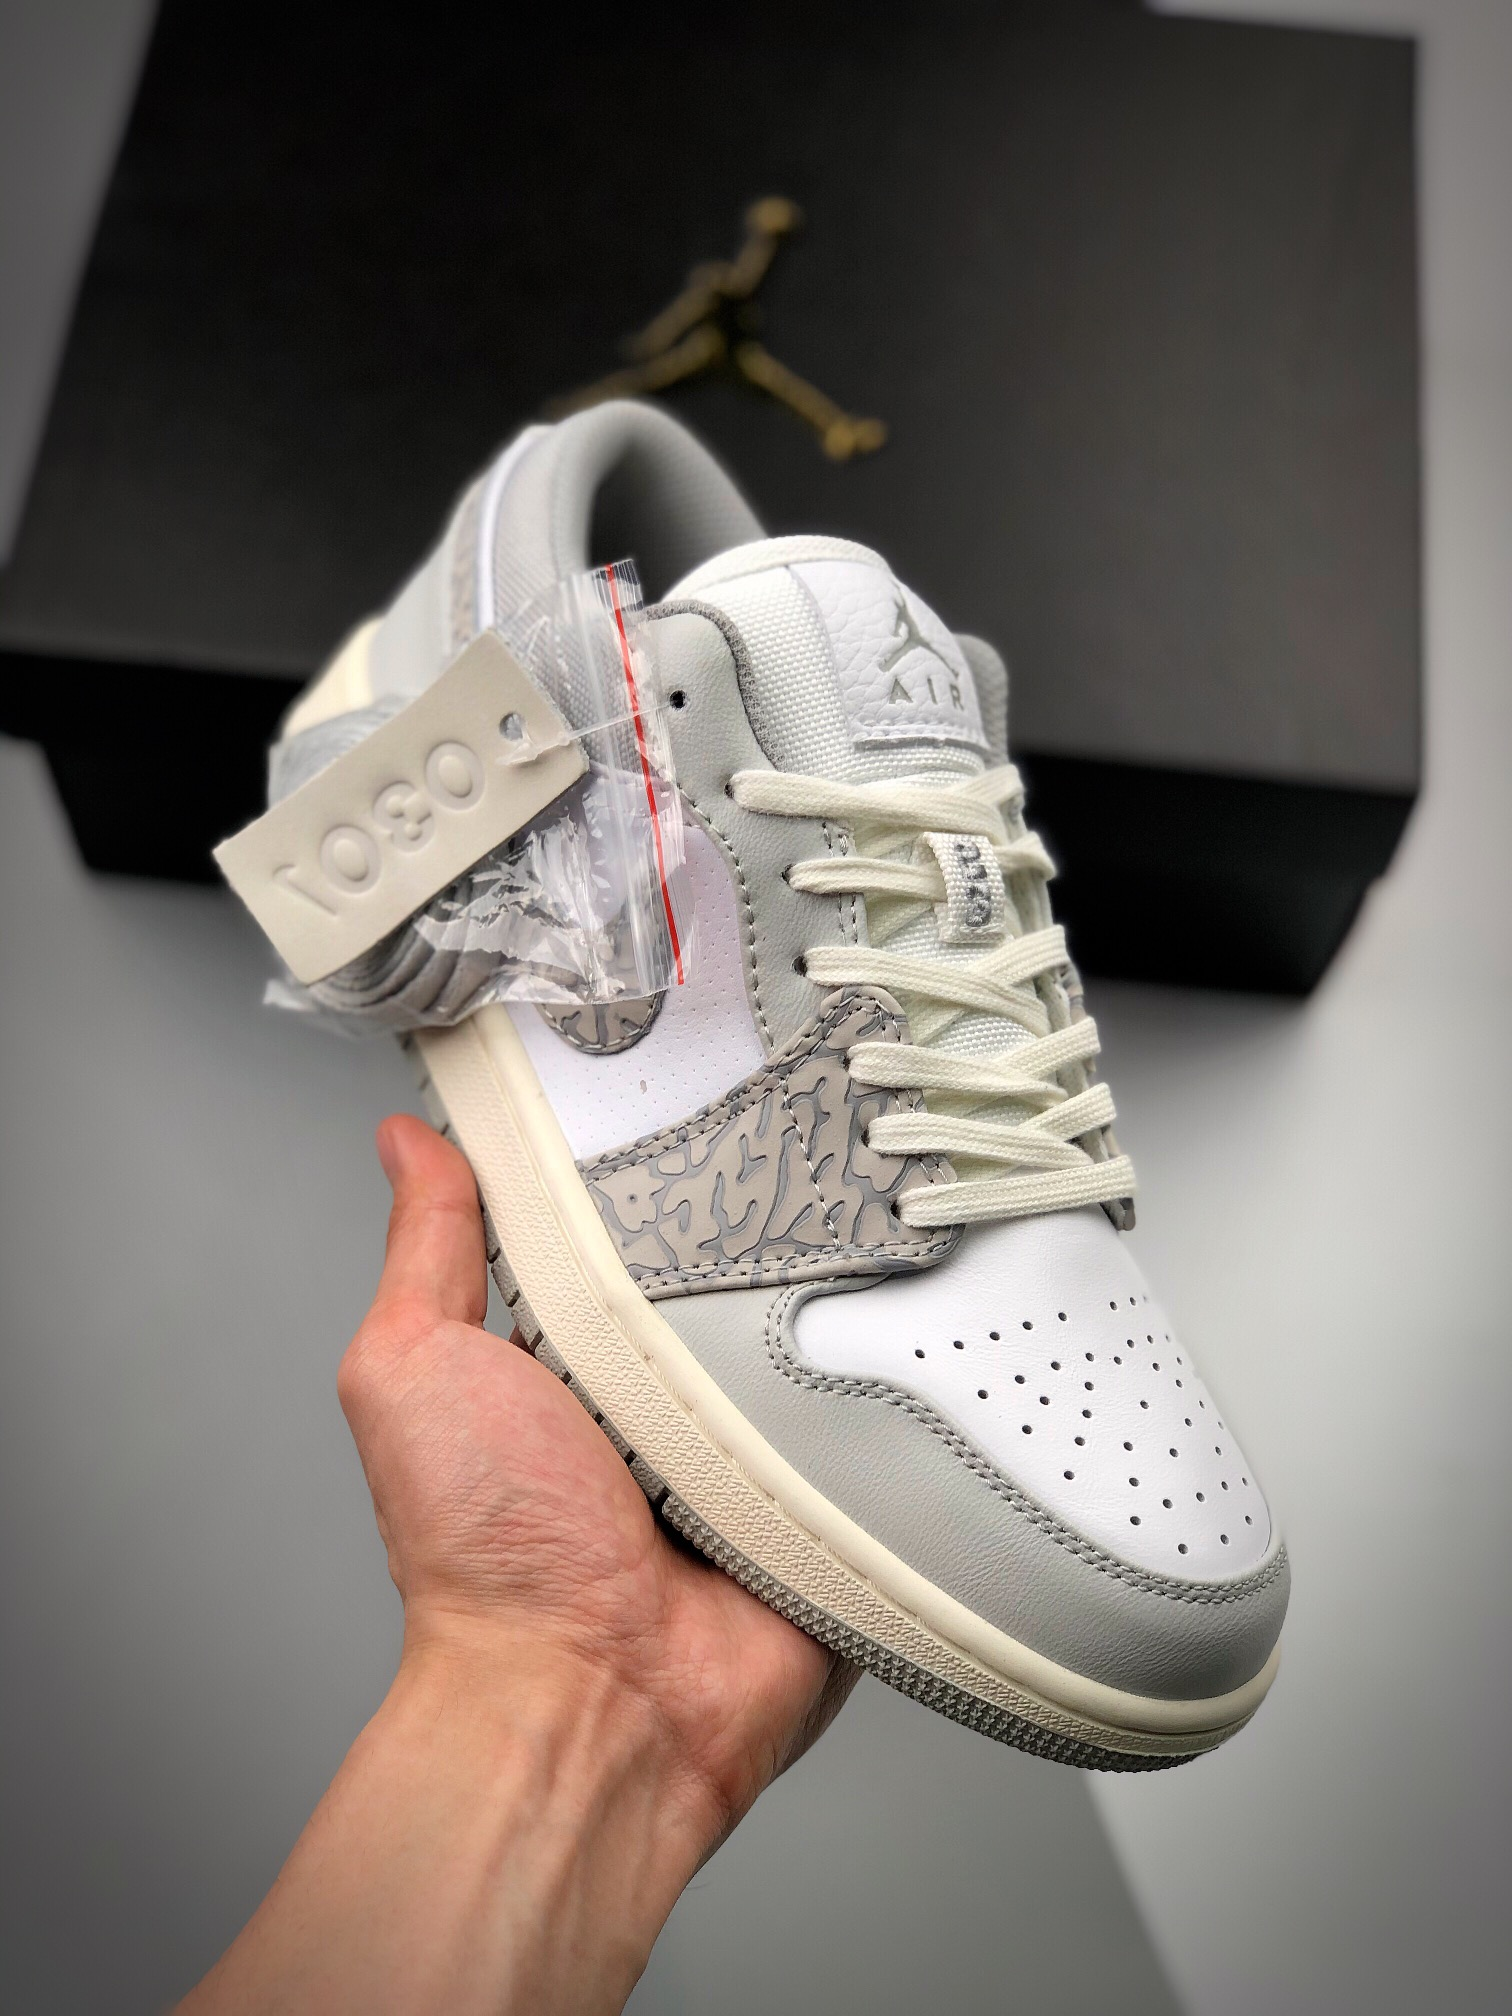 Air Jordan 1 Low 灰爆裂_s2纯原微